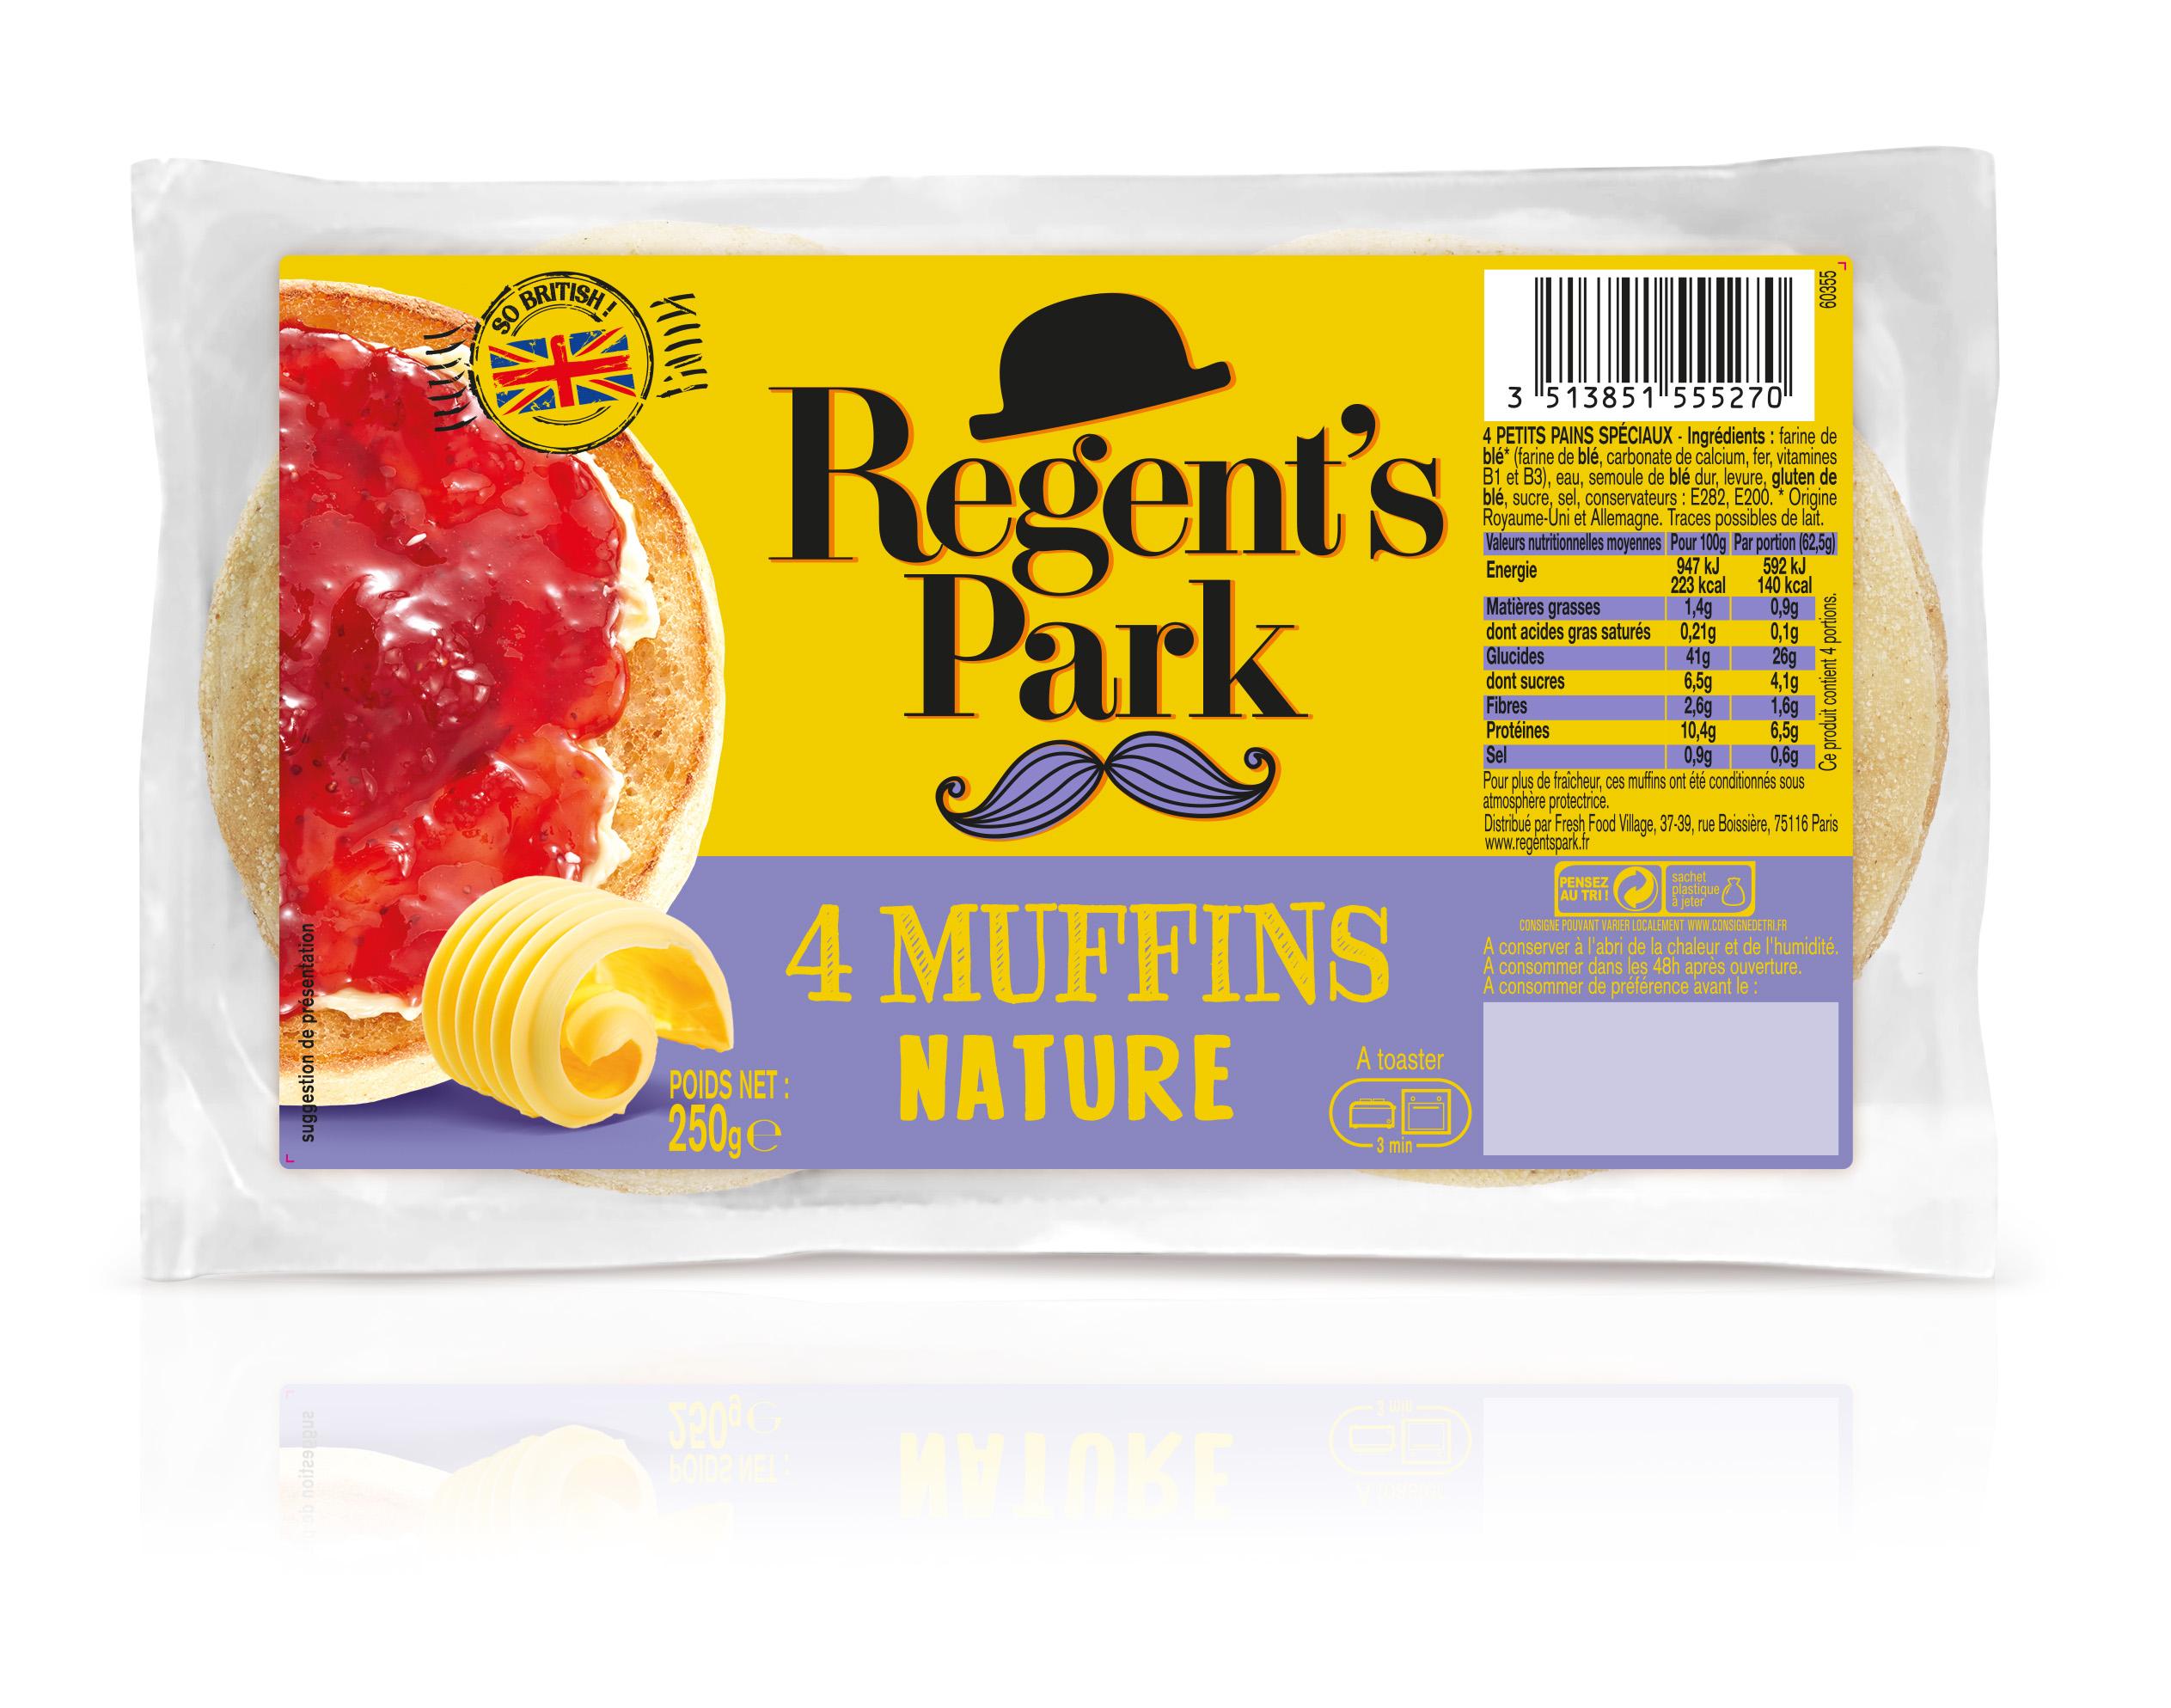 English Muffins nature, Regent's Park (250 g)